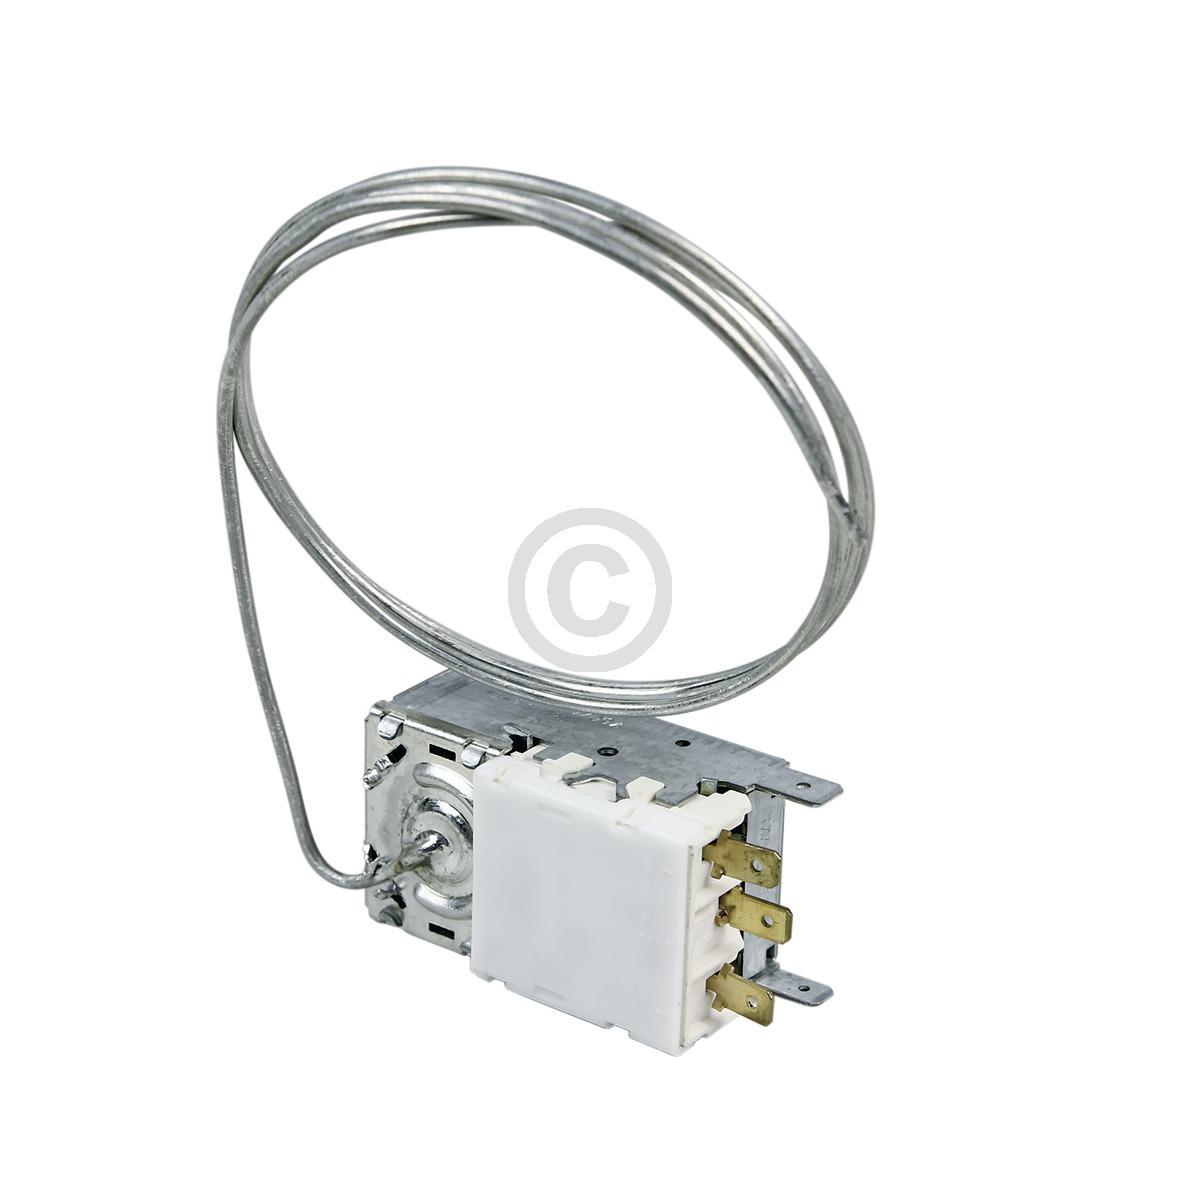 Thermostat K59-H2800 Ranco, AT! Liebherr, Bauknecht, Whirlpool, Ikea, Miele